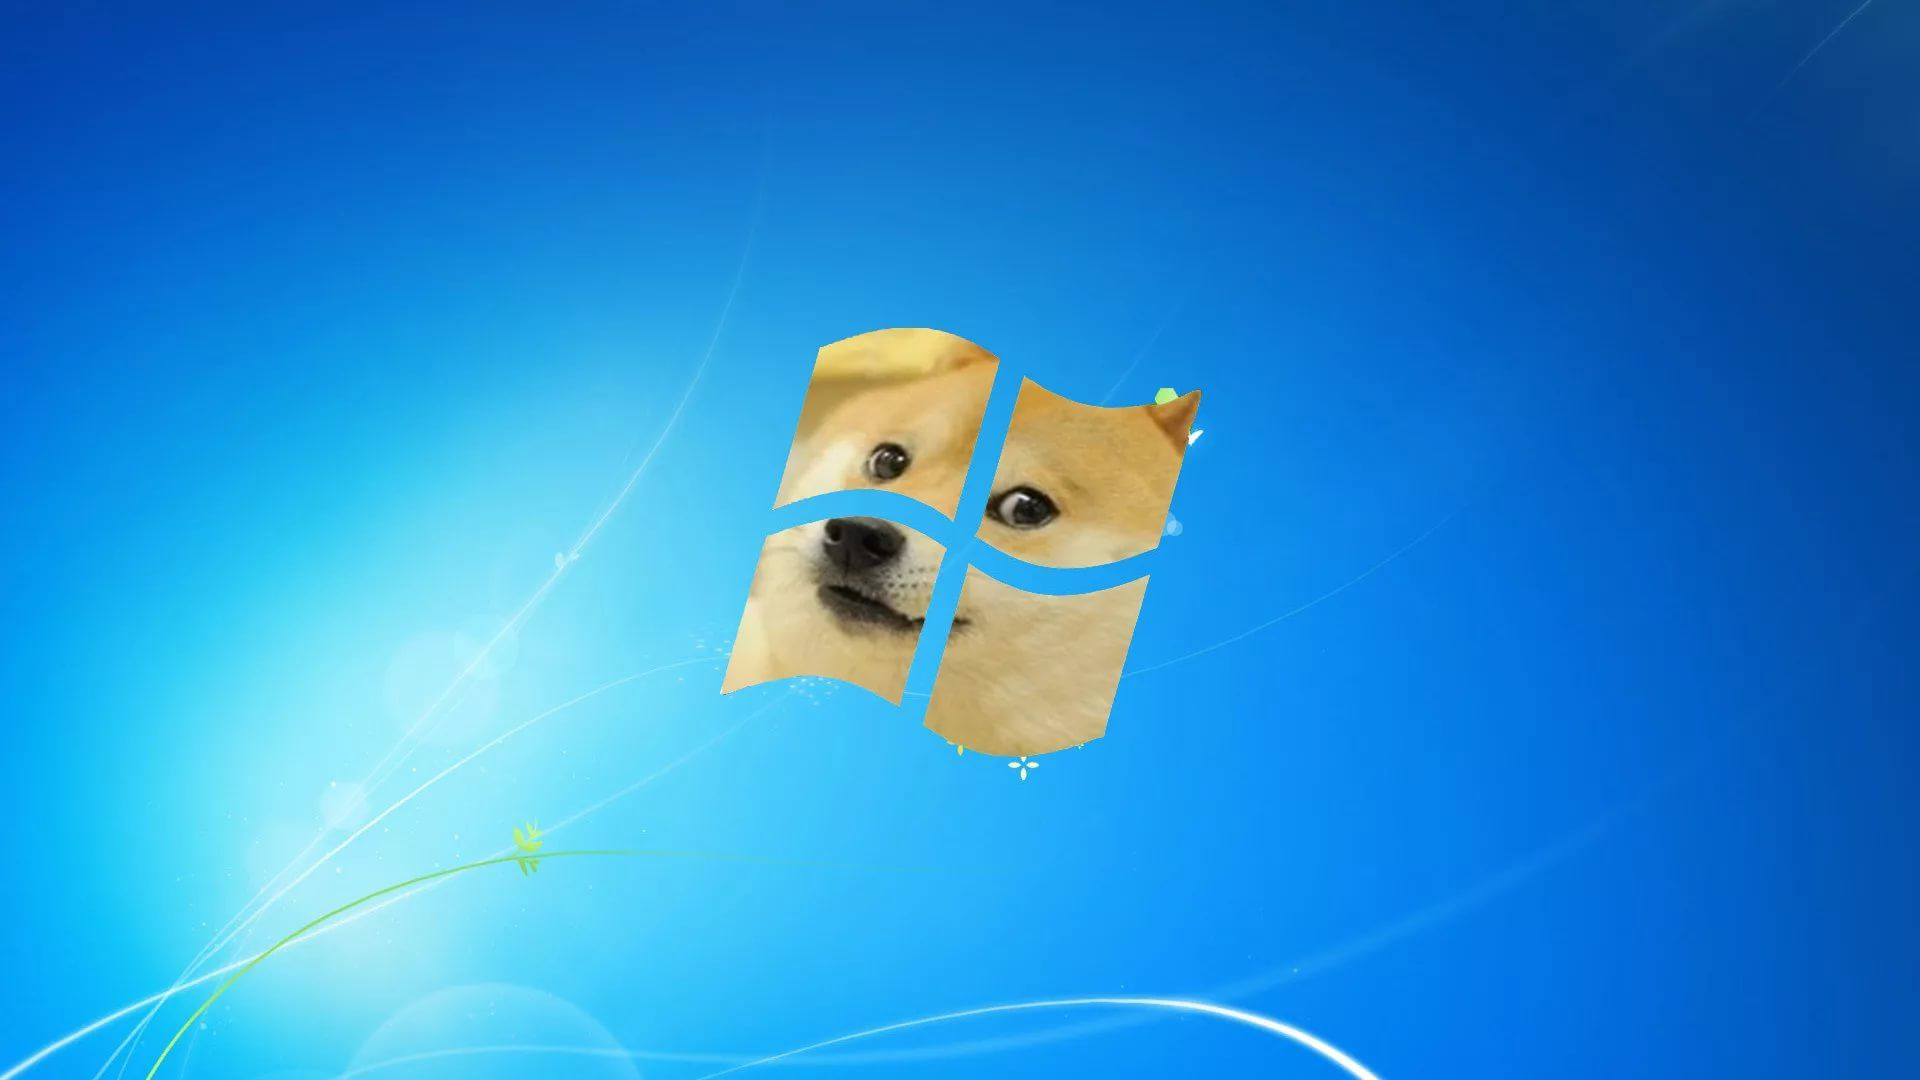 Wiener Dog Meme 700x863 Wallpaper Teahub Io